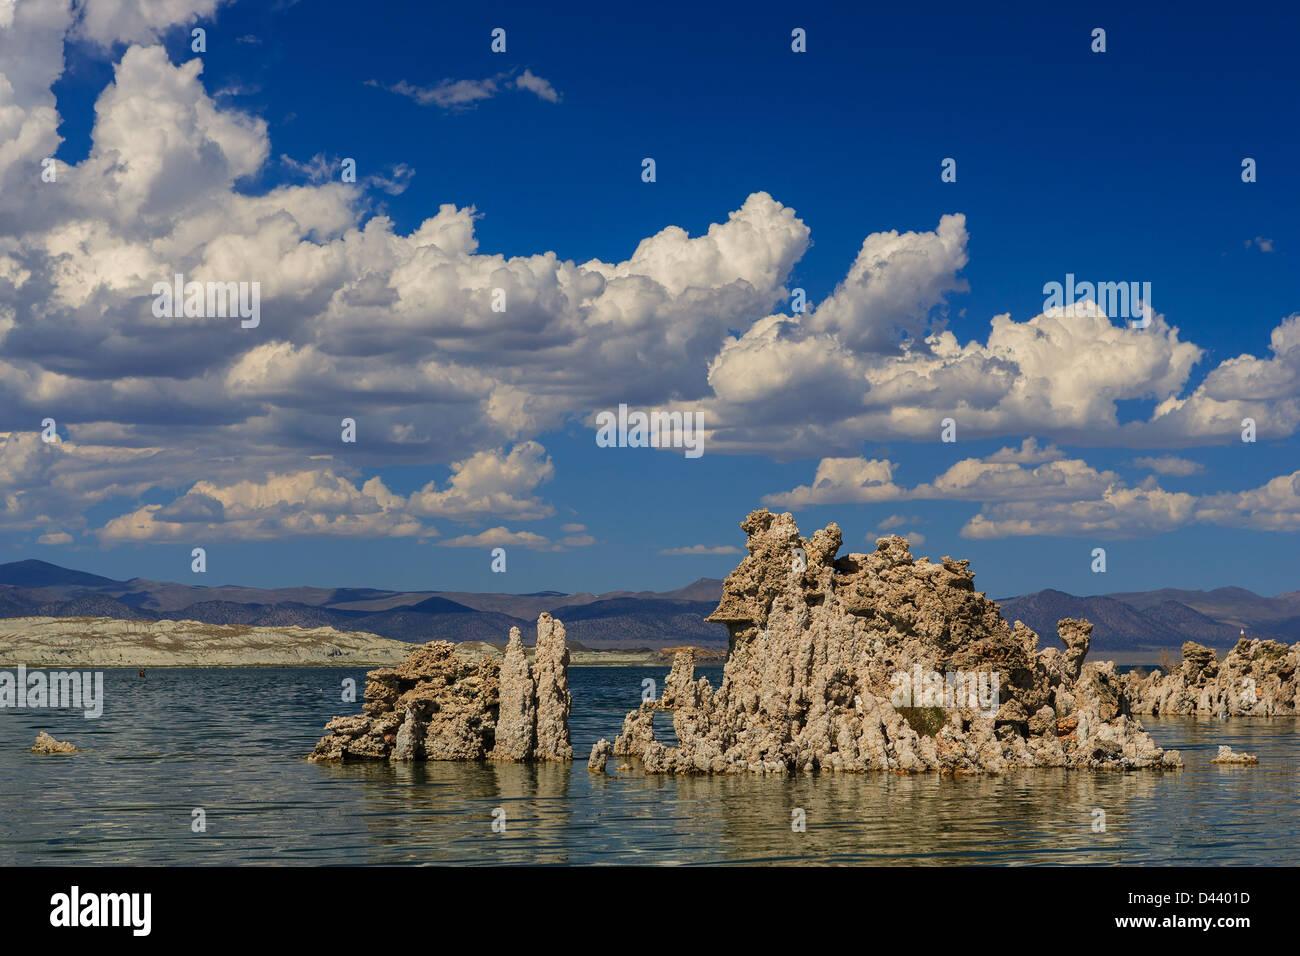 South Tufa Beach, Mono Lake, California, USA - Stock Image